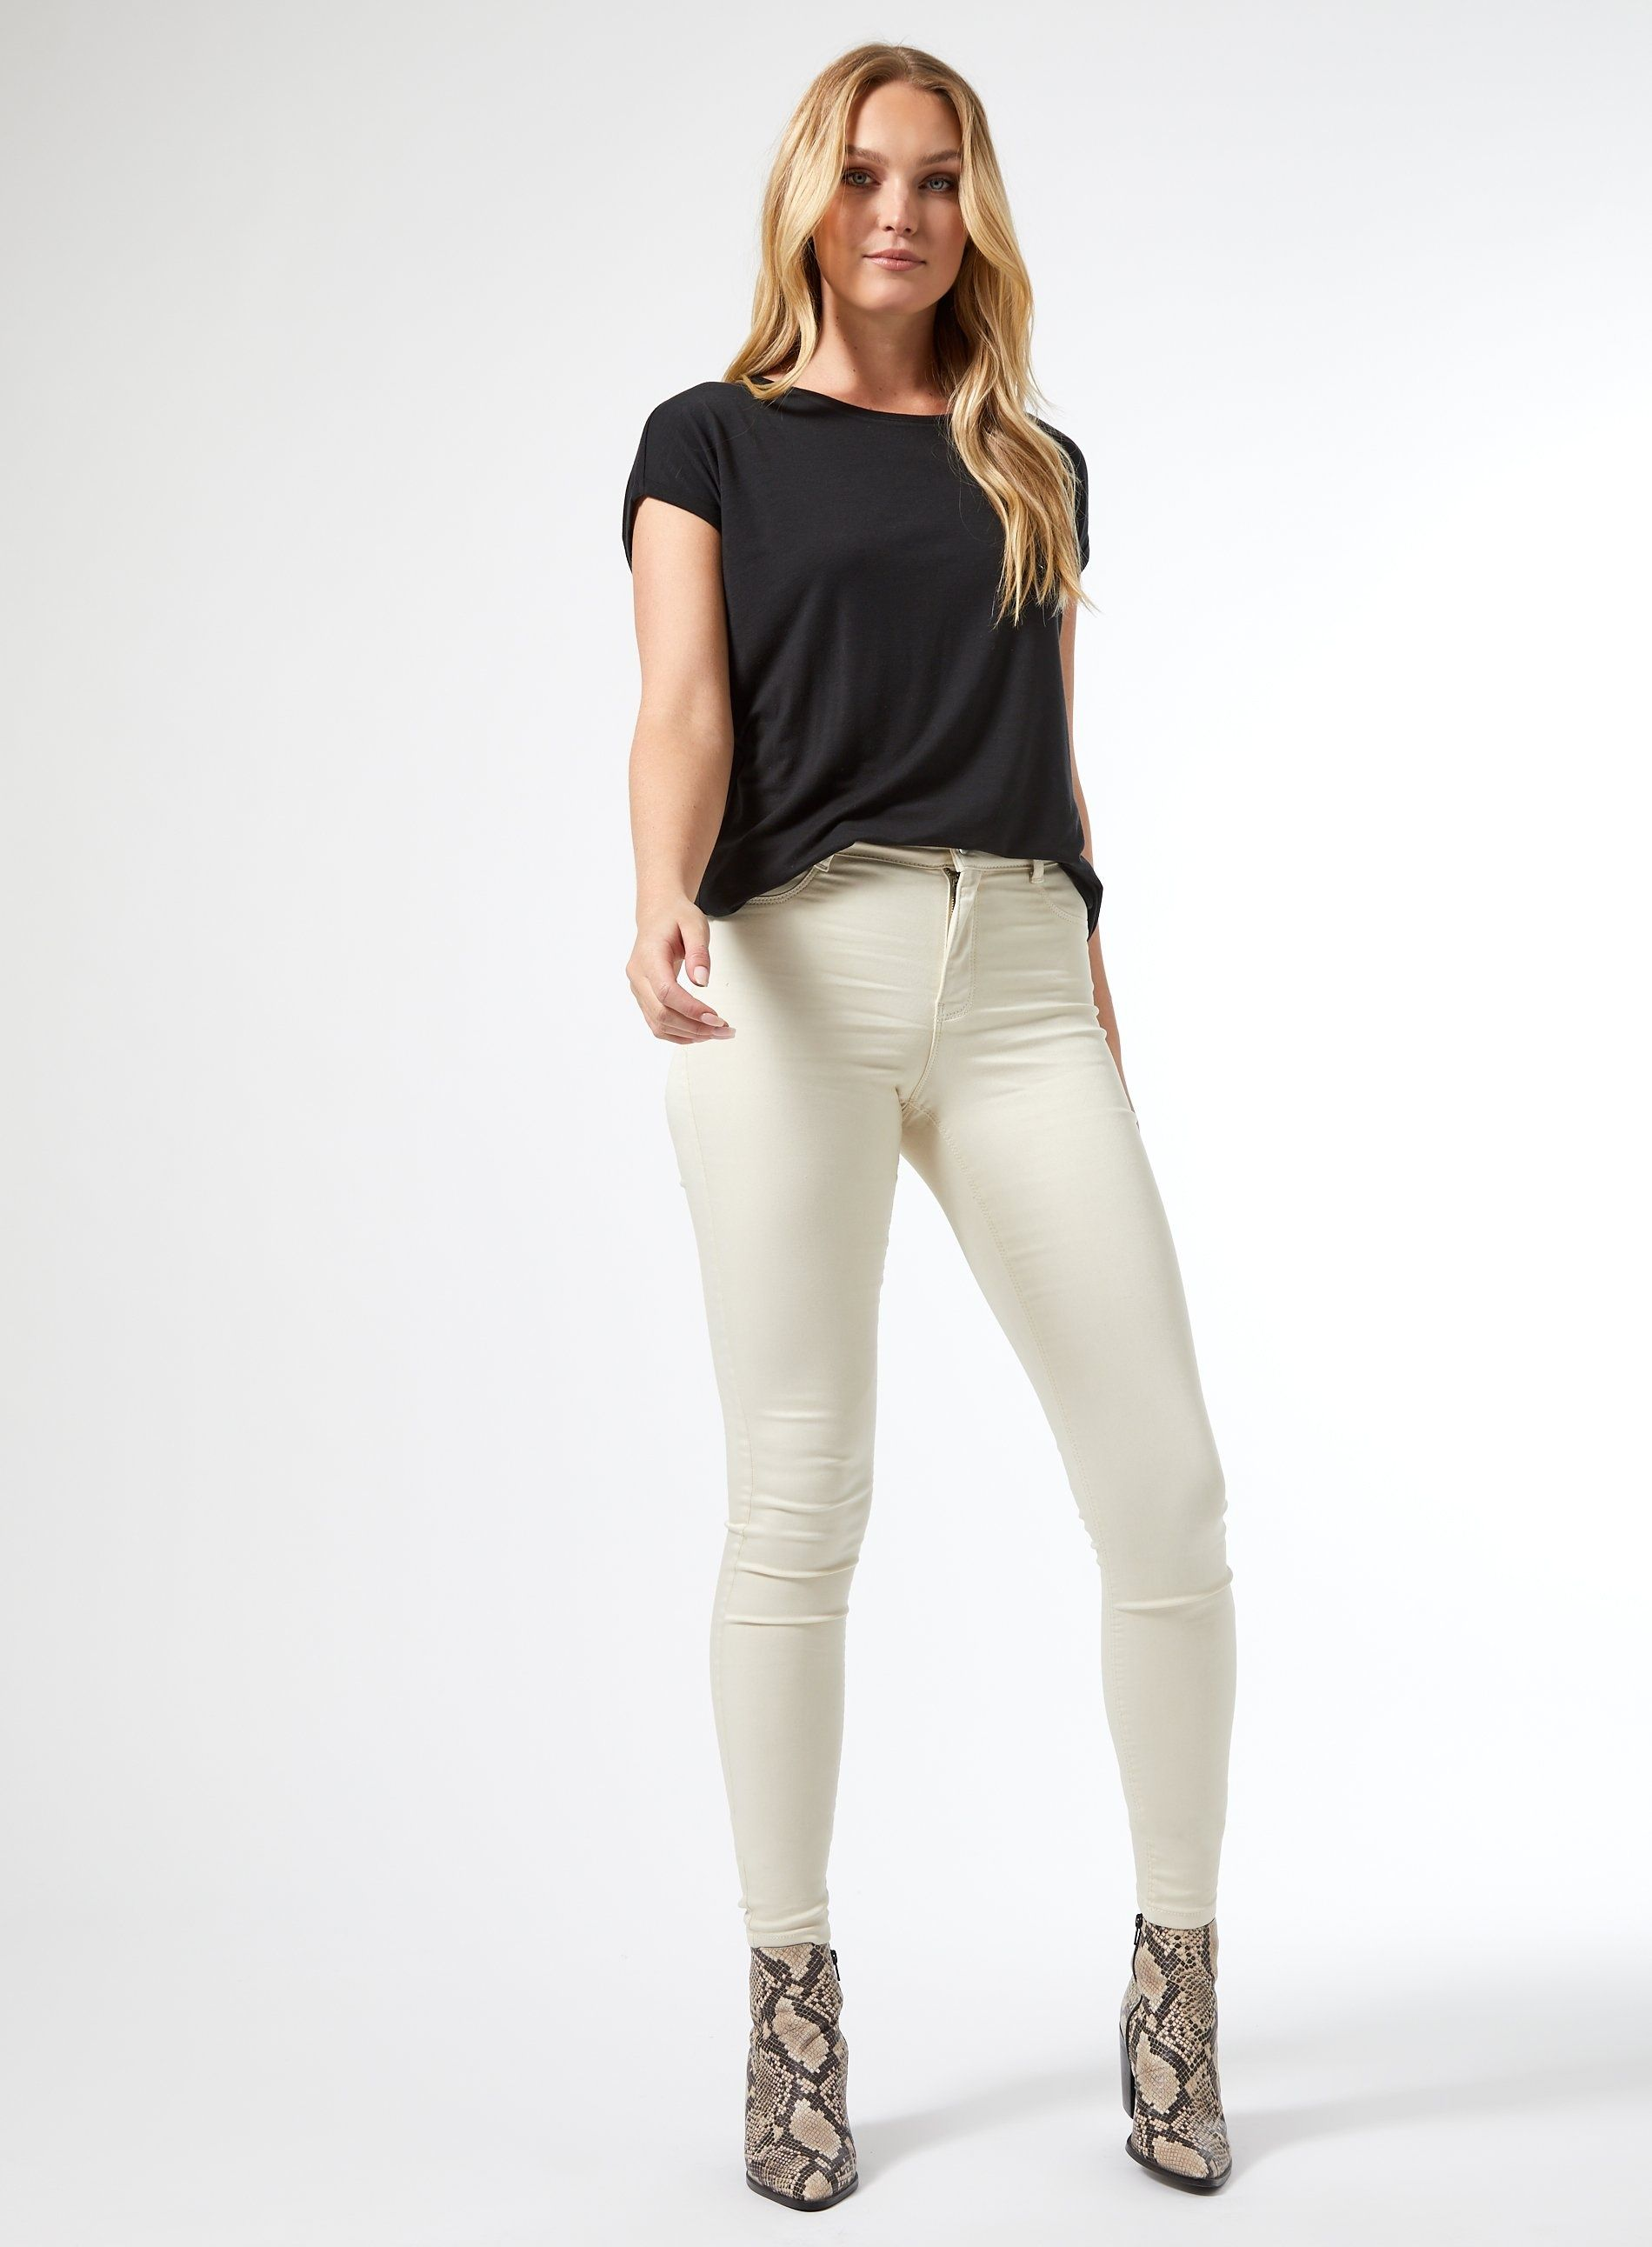 Dorothy Perkins Womens Tall Ivory Frankie Denim Jeans Mid Rise Soft Skinny Pants